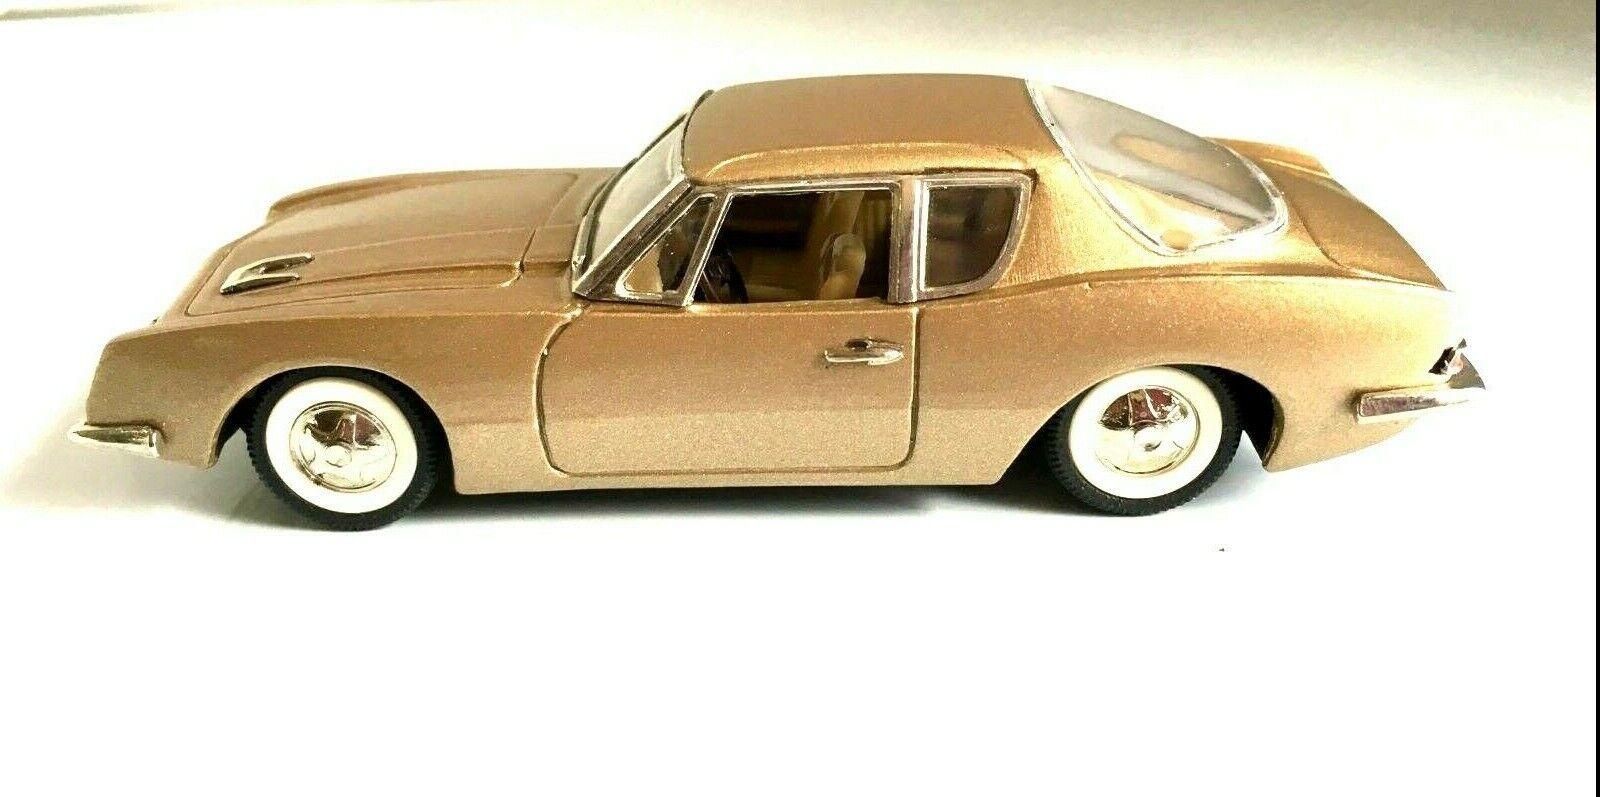 Buby 1 43 O Scale Diecast Studebaker Avanti '64 Model Car  gold